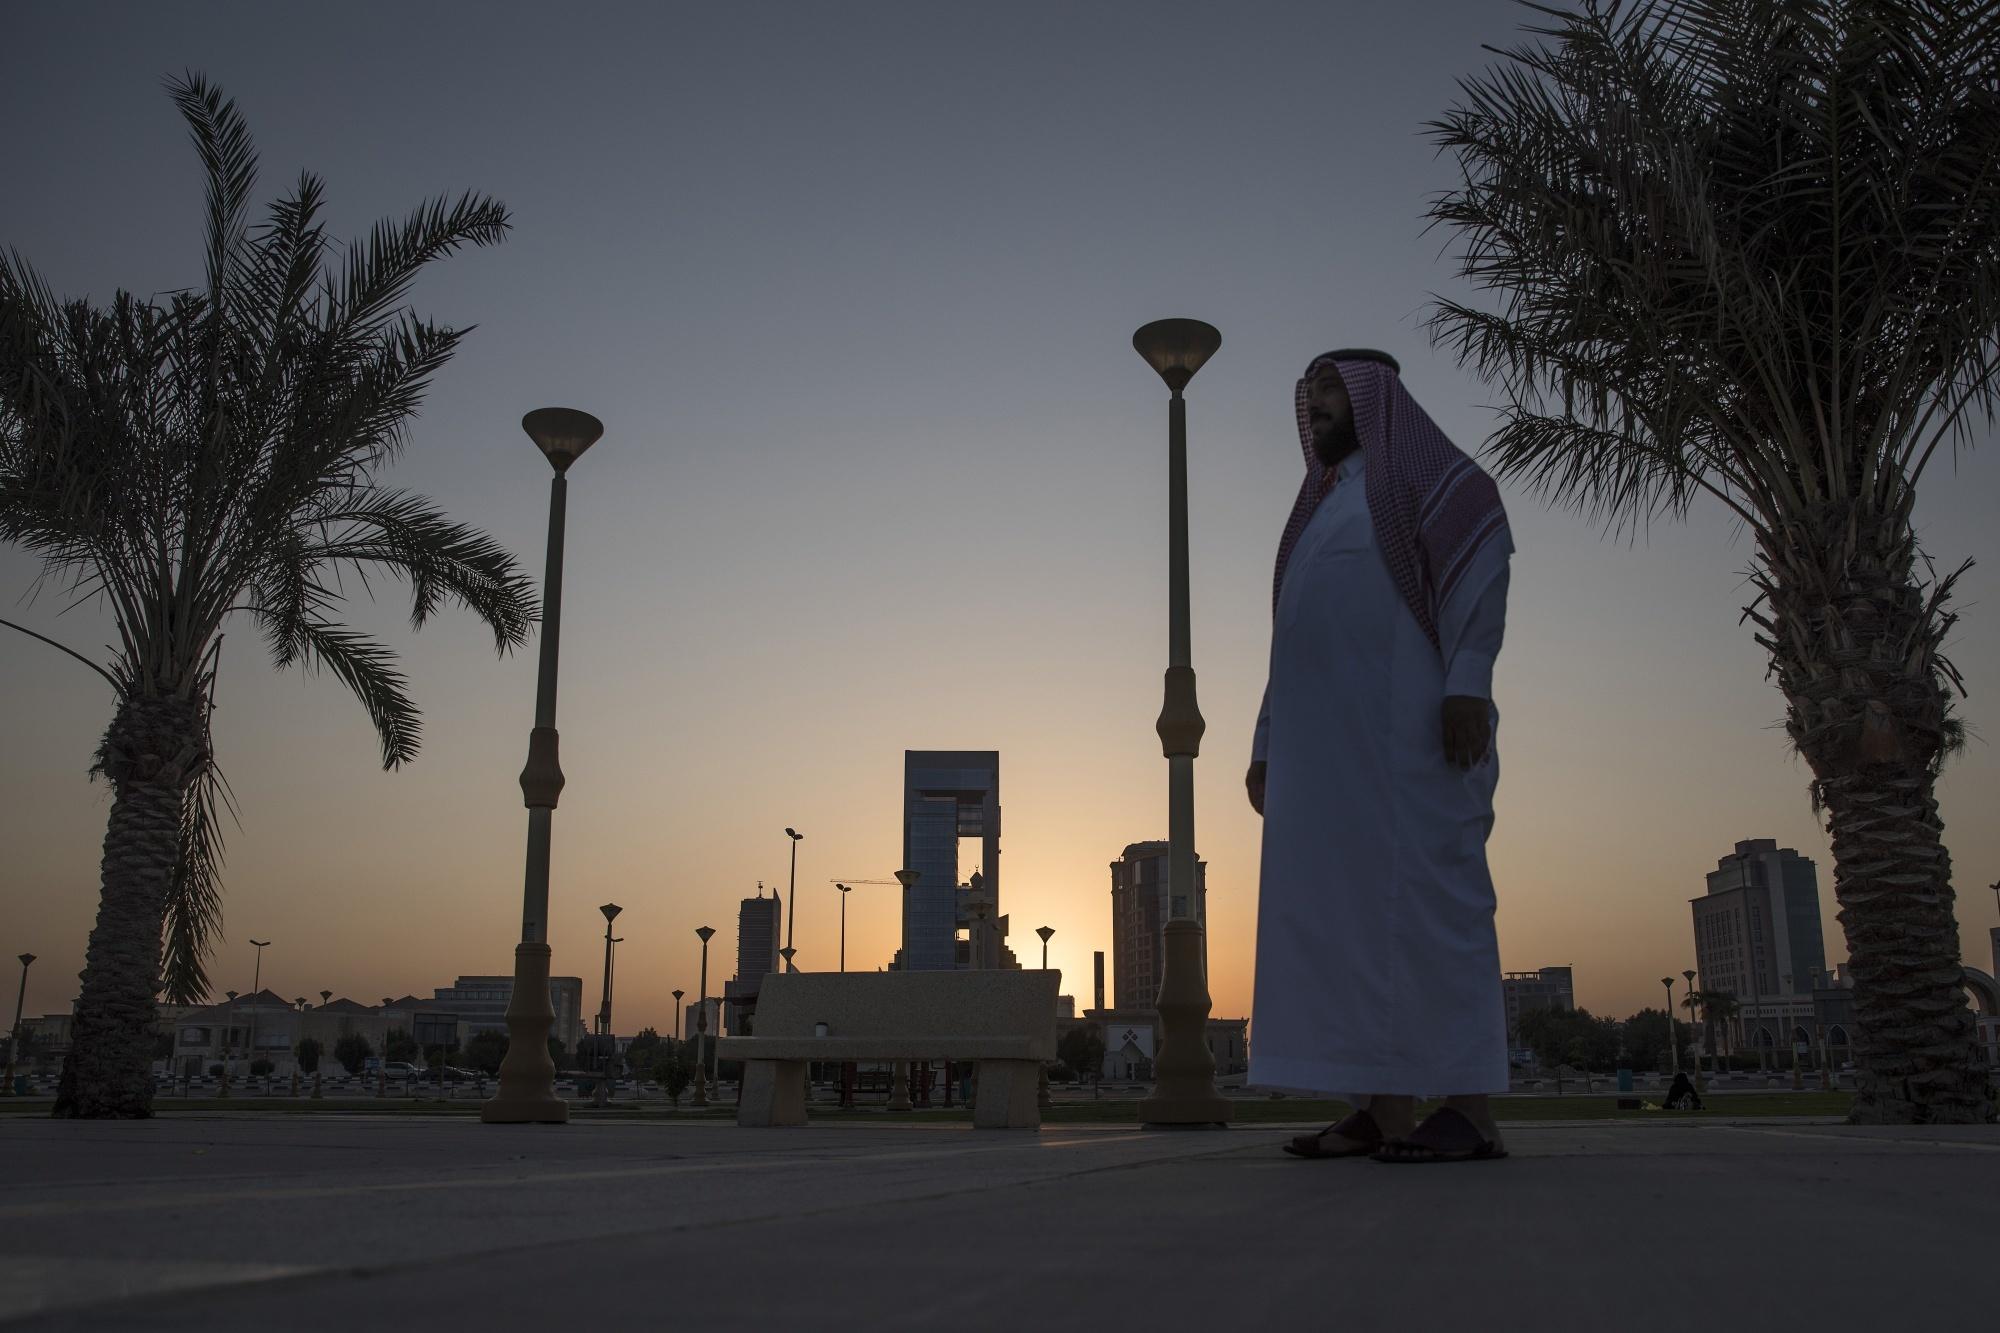 A man walks past palm trees lining the corniche promenade in Dhahran, Saudi Arabia, on Thursday, Oct. 4, 2018.